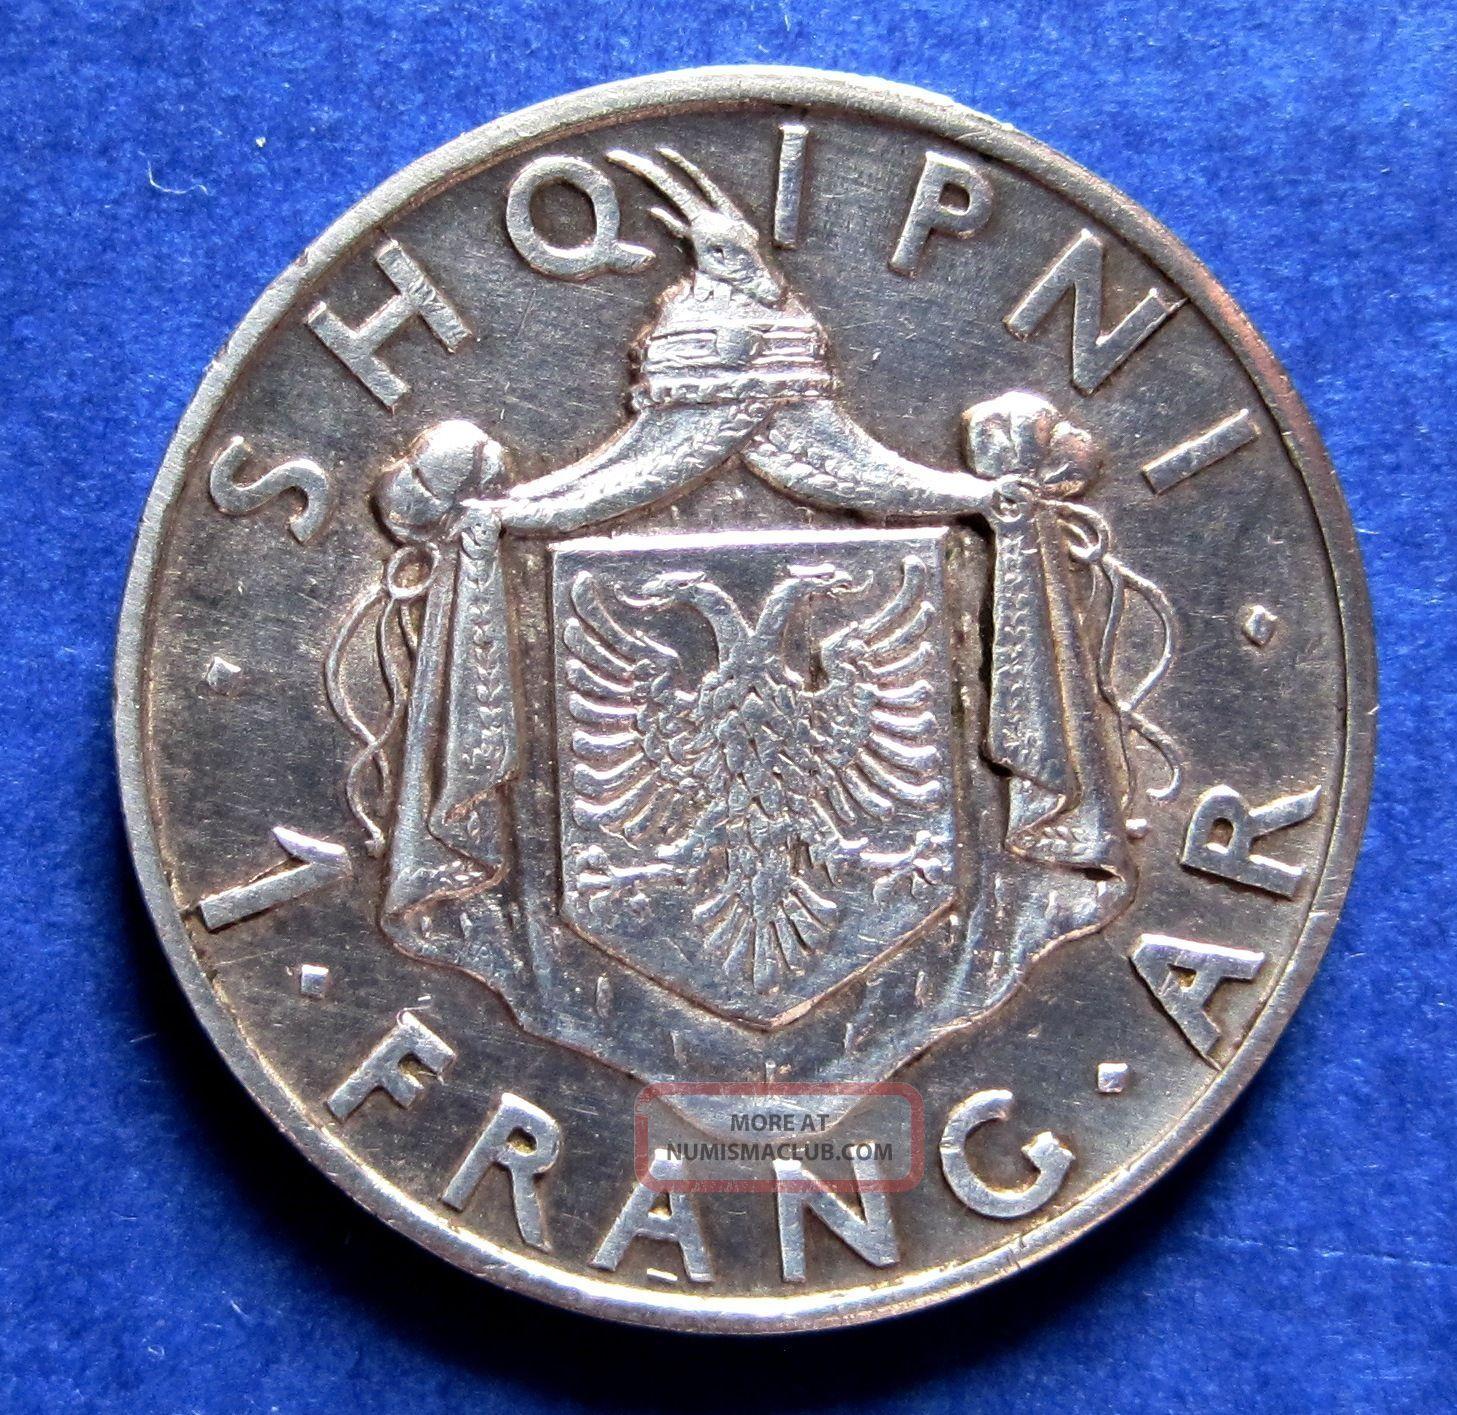 1937 Albania Coin 1 Frank Ar Silver 5 Gr Km 16 - Ahmed Bey Zogu - King Zog Europe photo